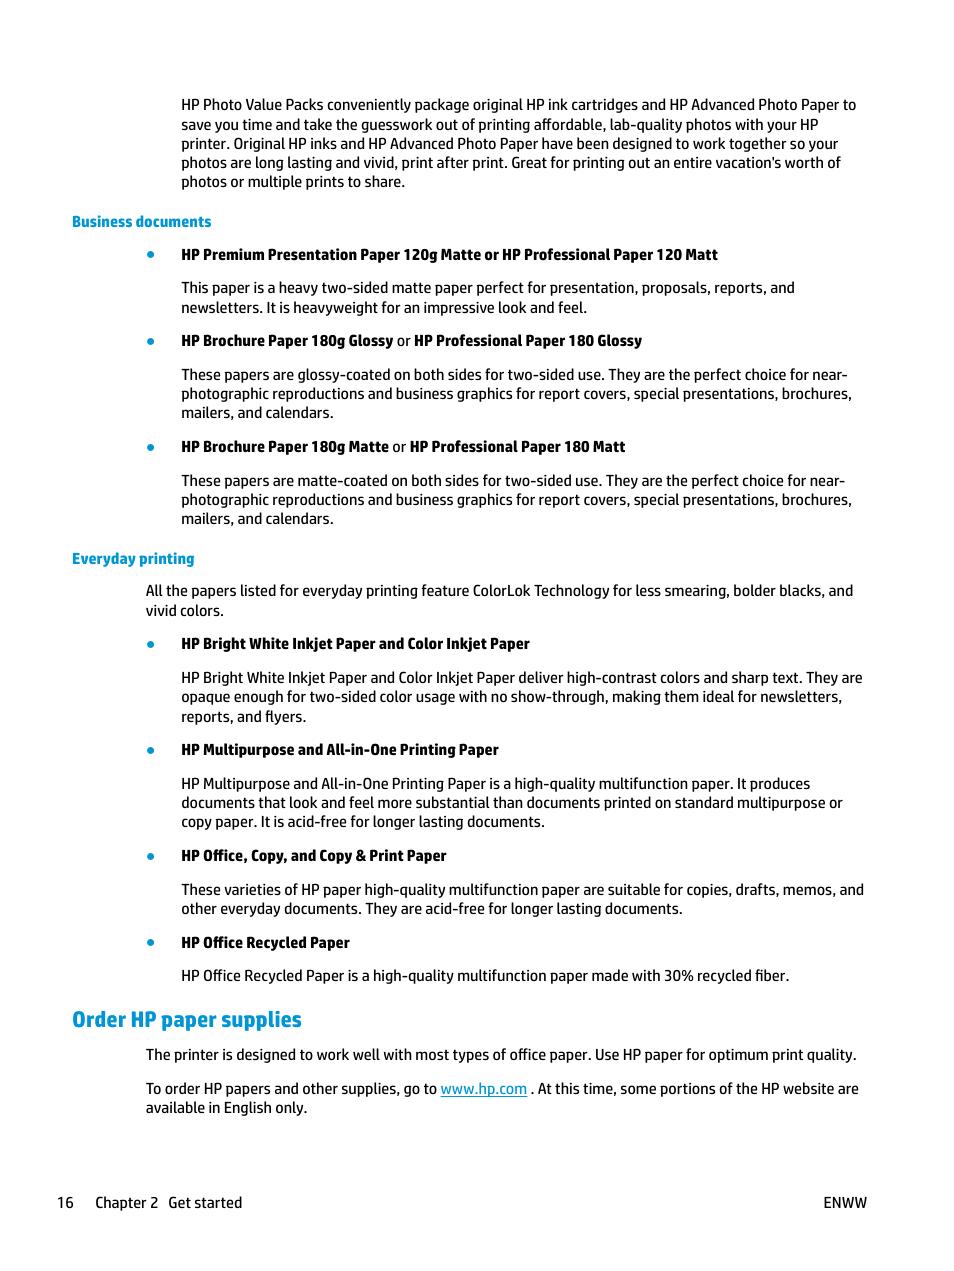 Order hp paper supplies | HP DeskJet 3700 User Manual ...